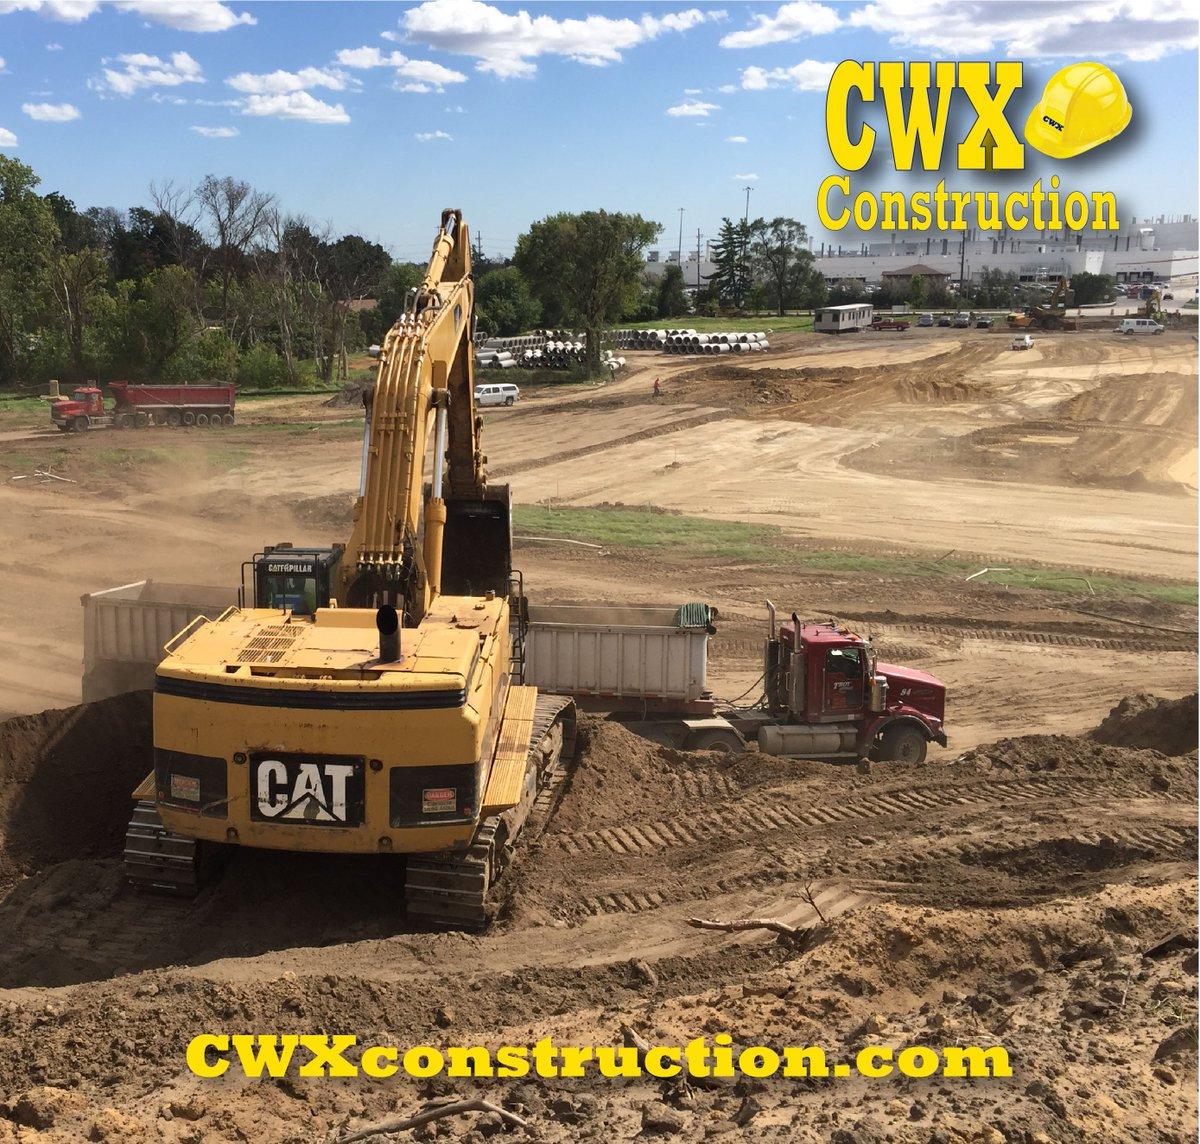 CWX Construction Group (@CWXconstruction) | Twitter